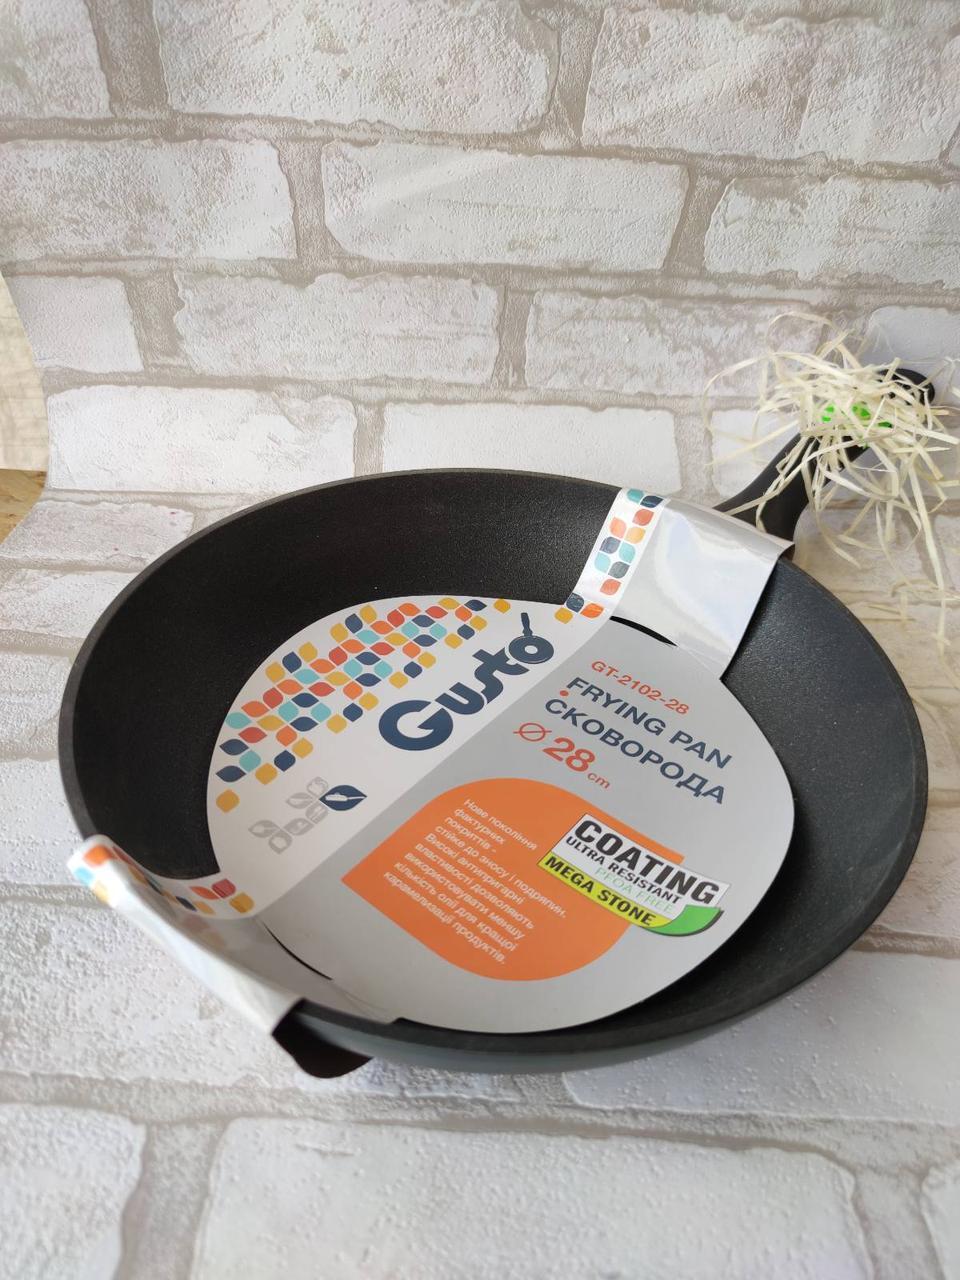 Сковорода класична Gusto GT-2102 d-28 365 грн